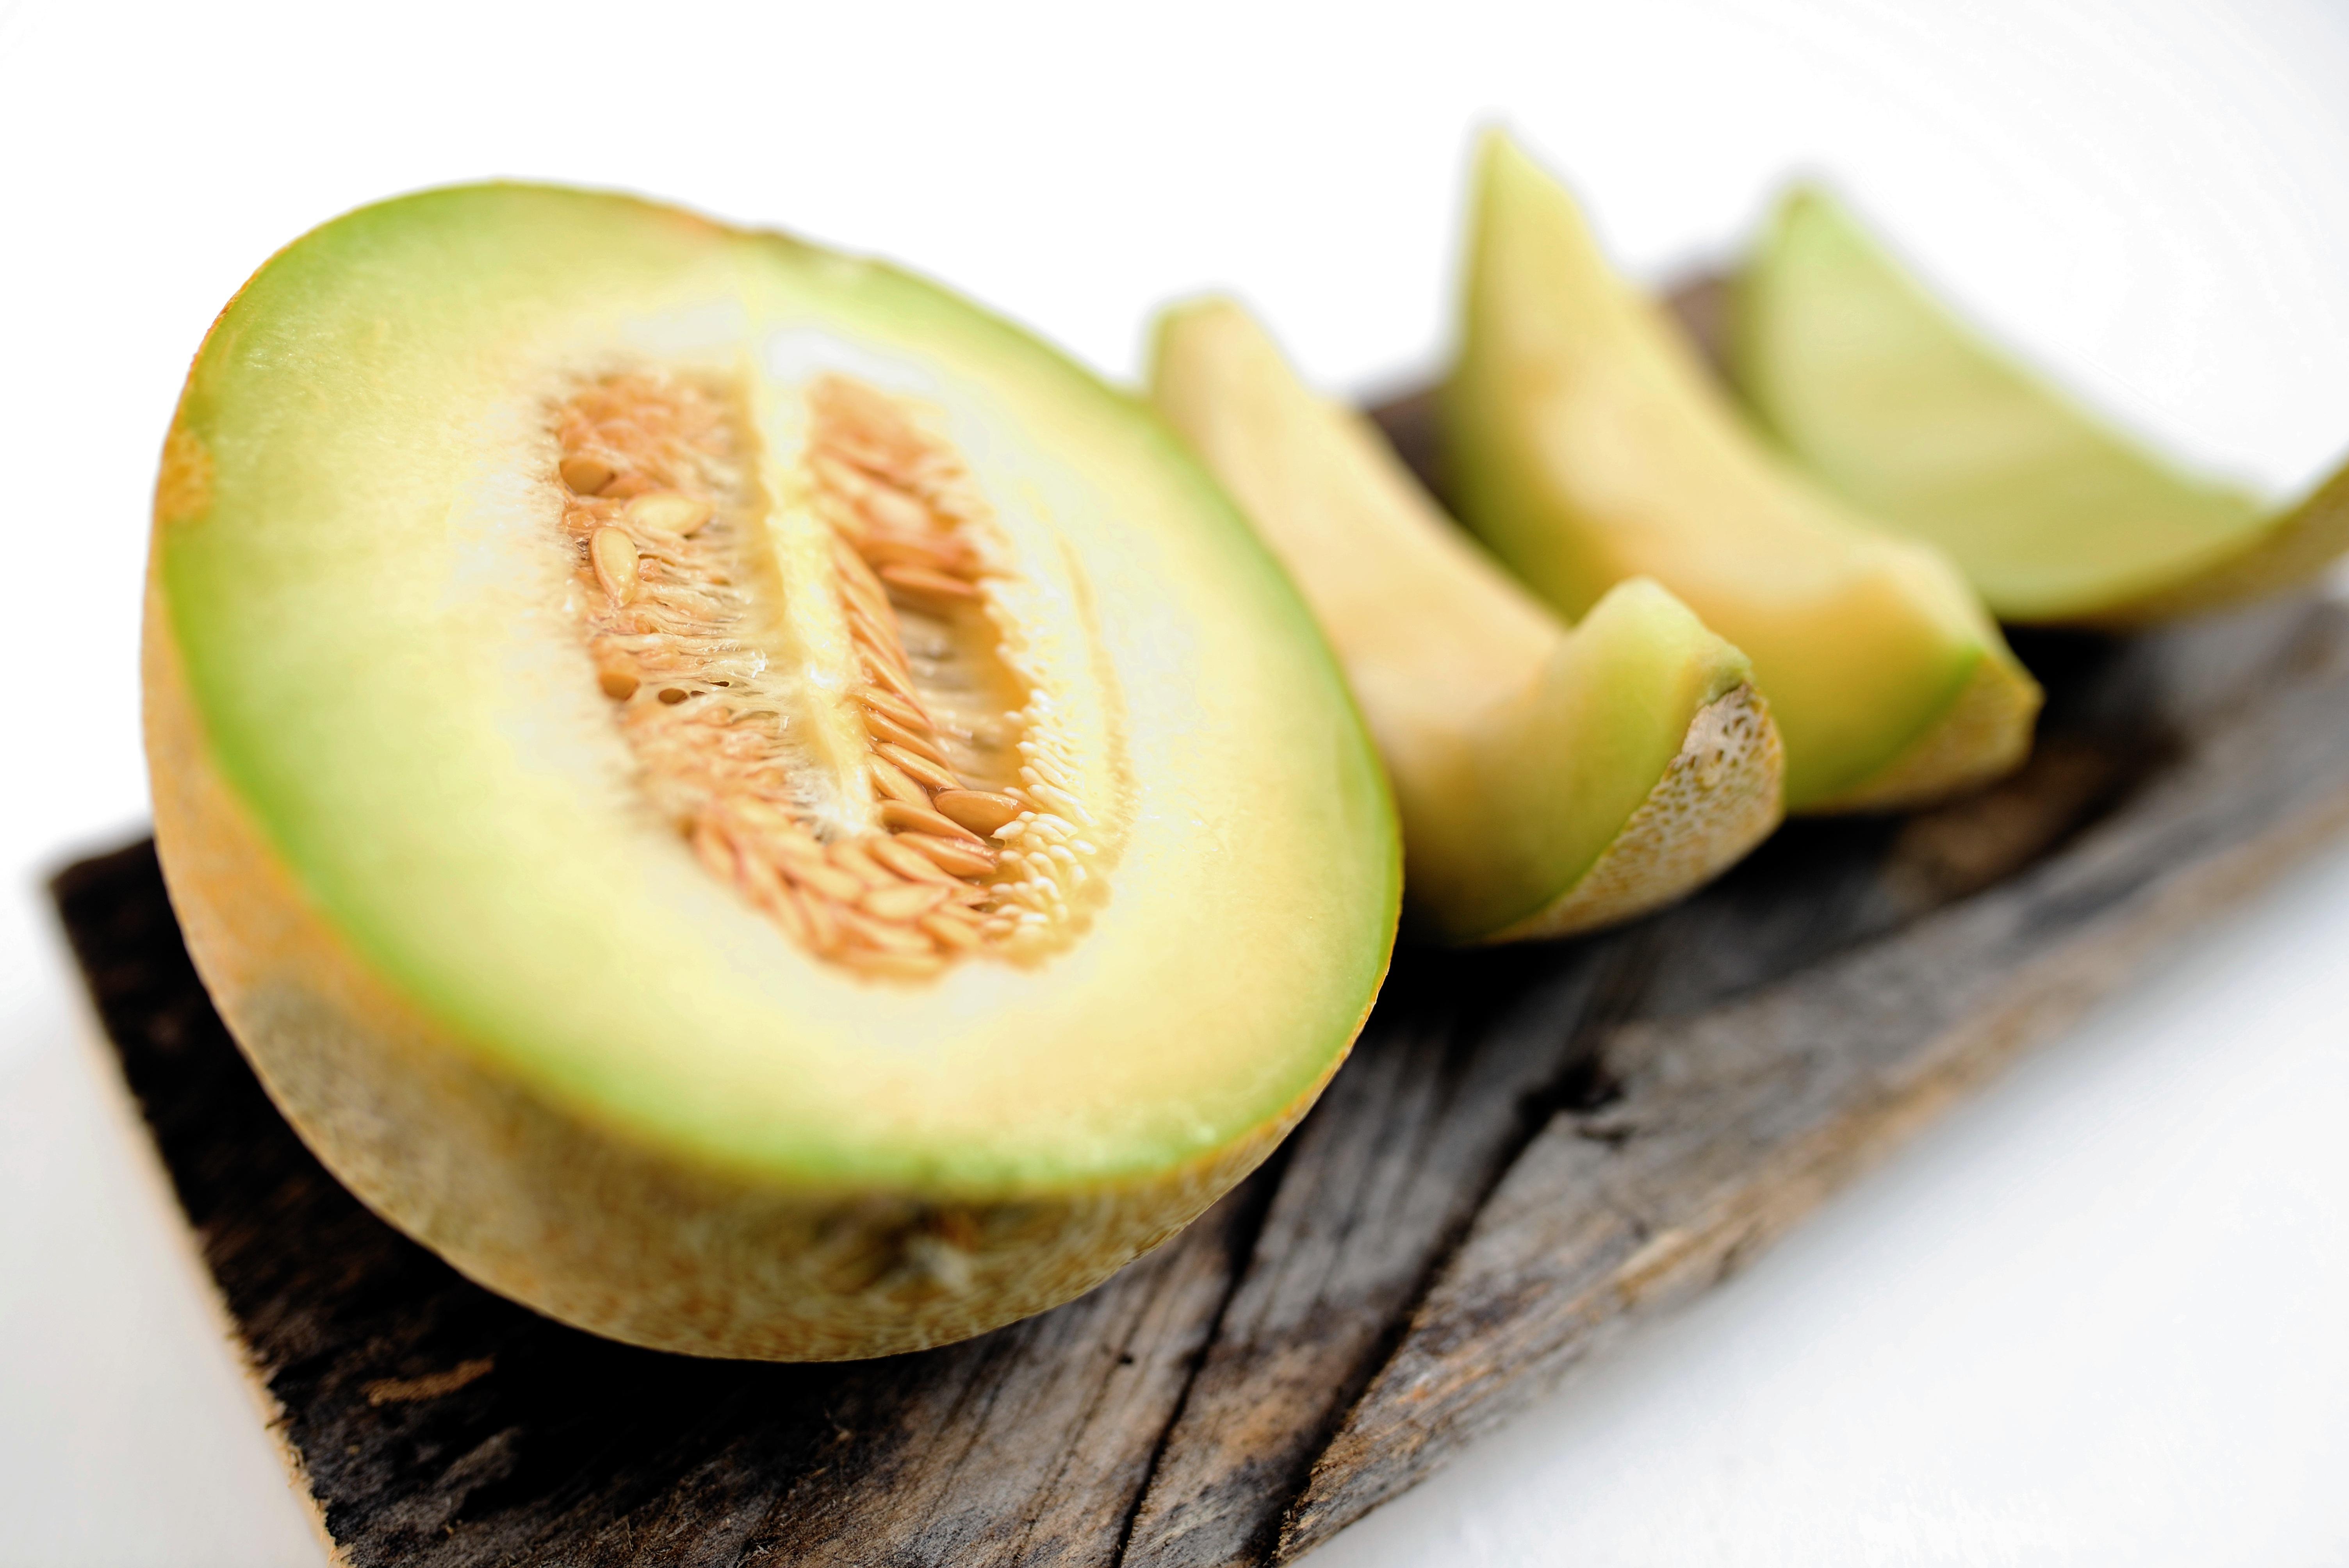 Bilder Bokeh Melone das Essen geschnittenes Nahaufnahme unscharfer Hintergrund Geschnitten geschnittene Lebensmittel hautnah Großansicht